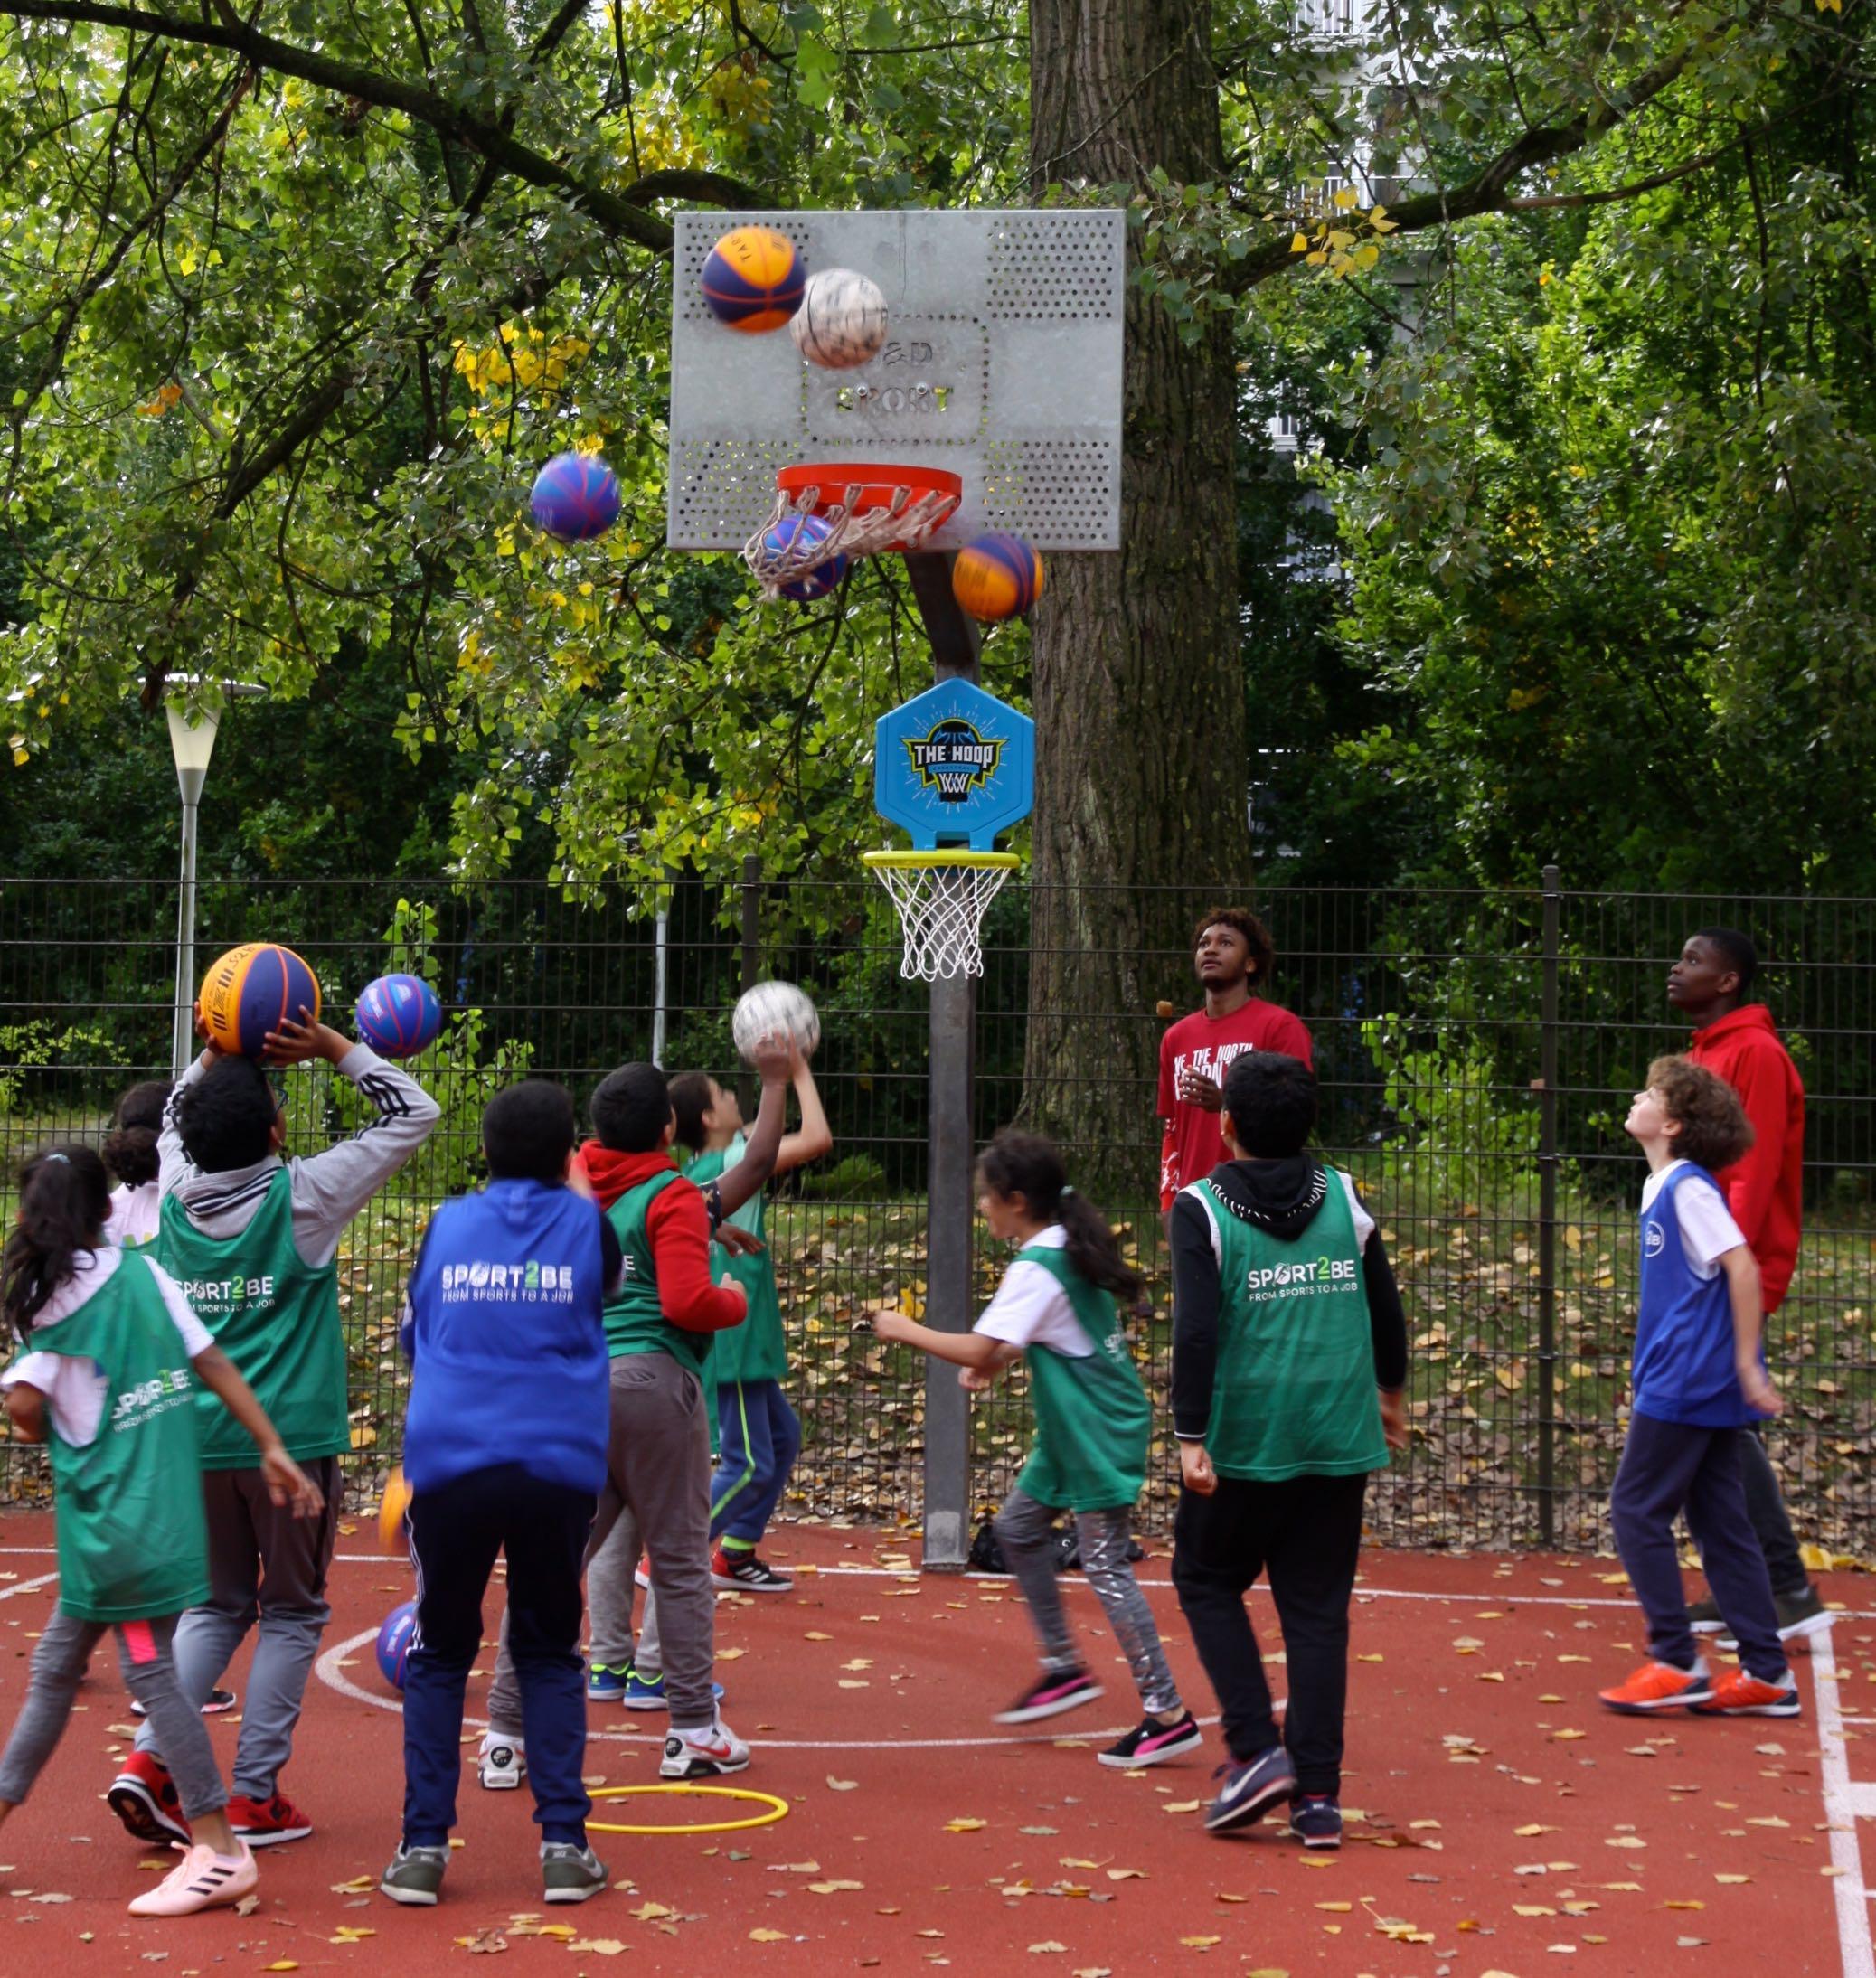 photo Sport2Be